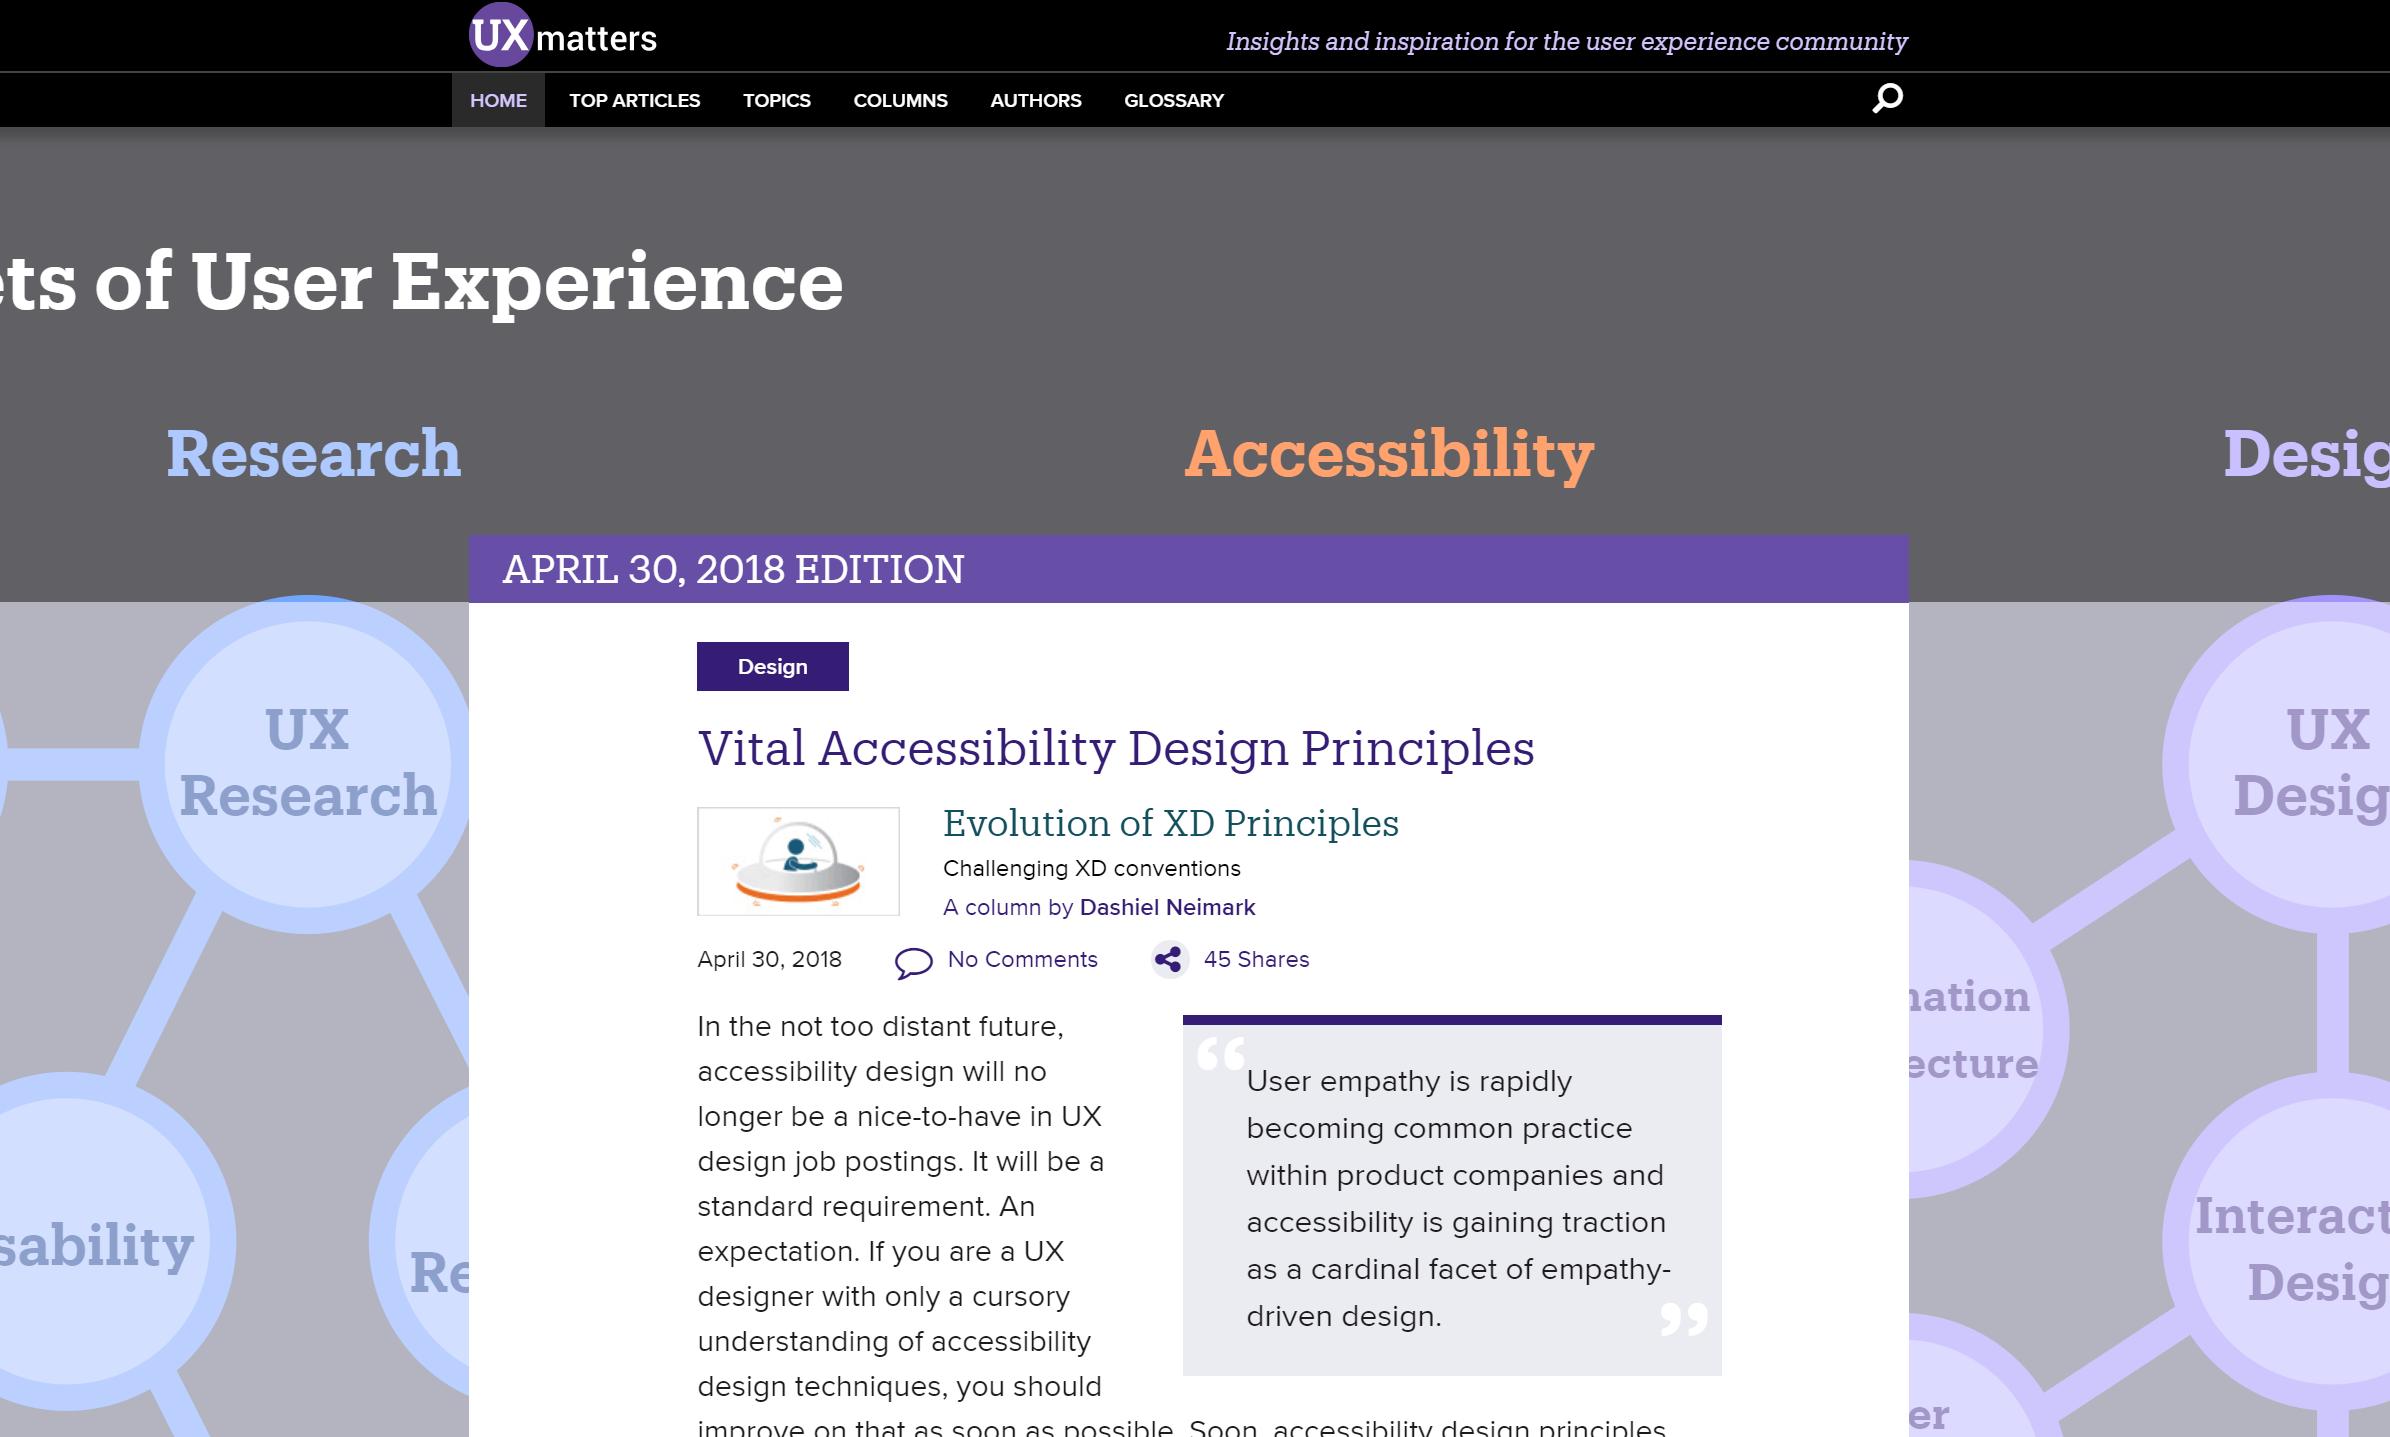 Vital Accessibility Design Principles